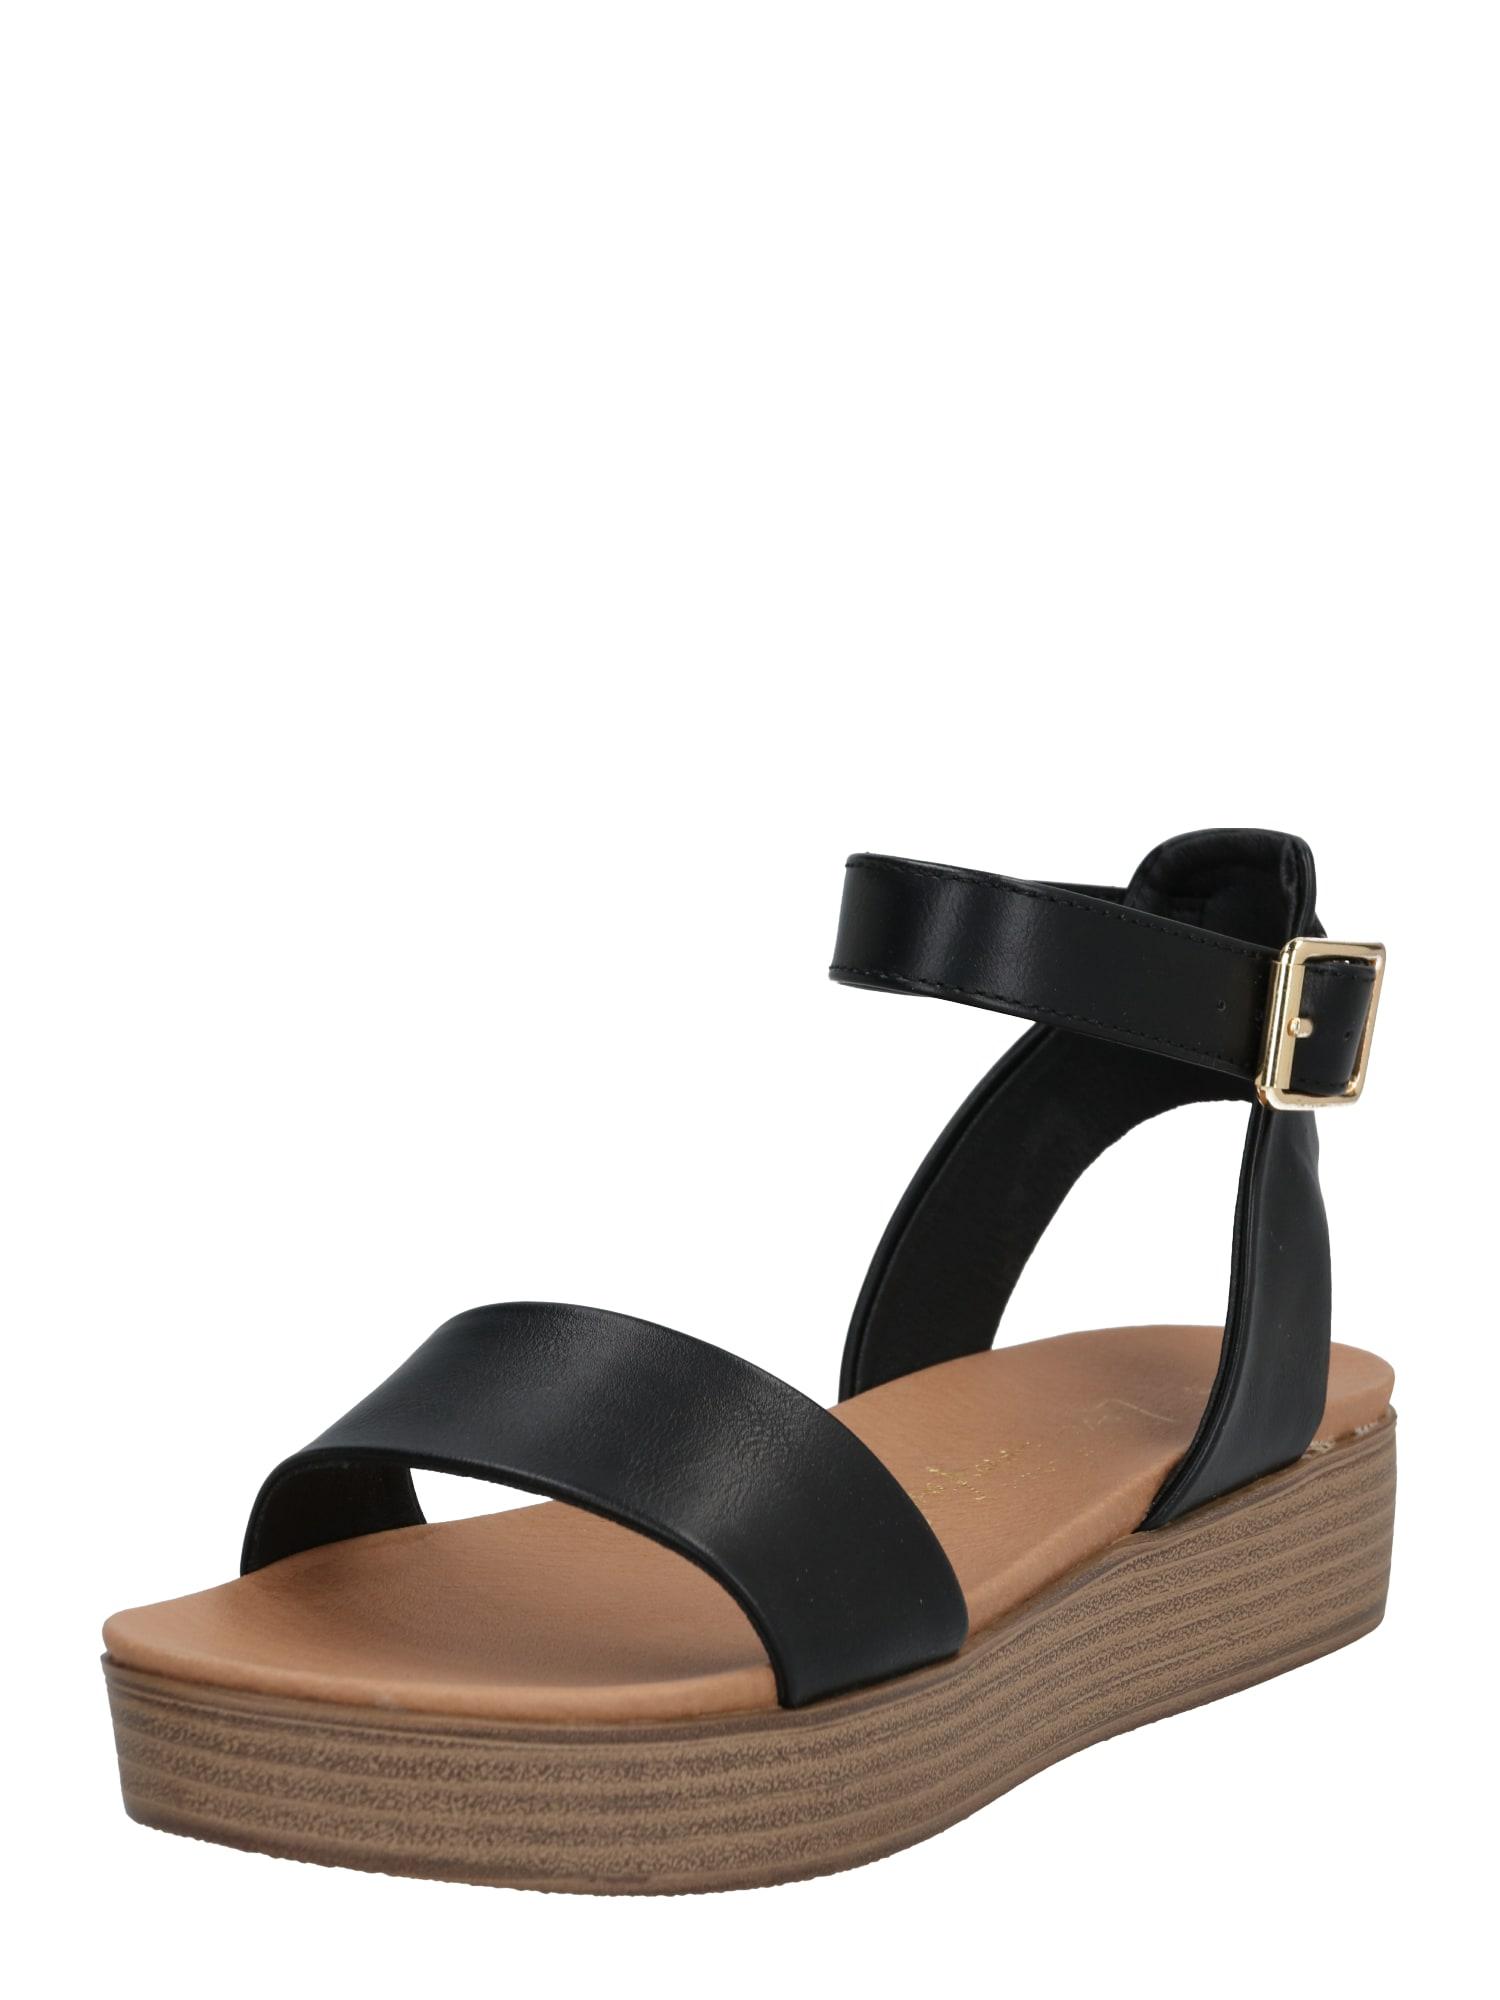 NEW LOOK Sandále 'GENIUS'  čierna